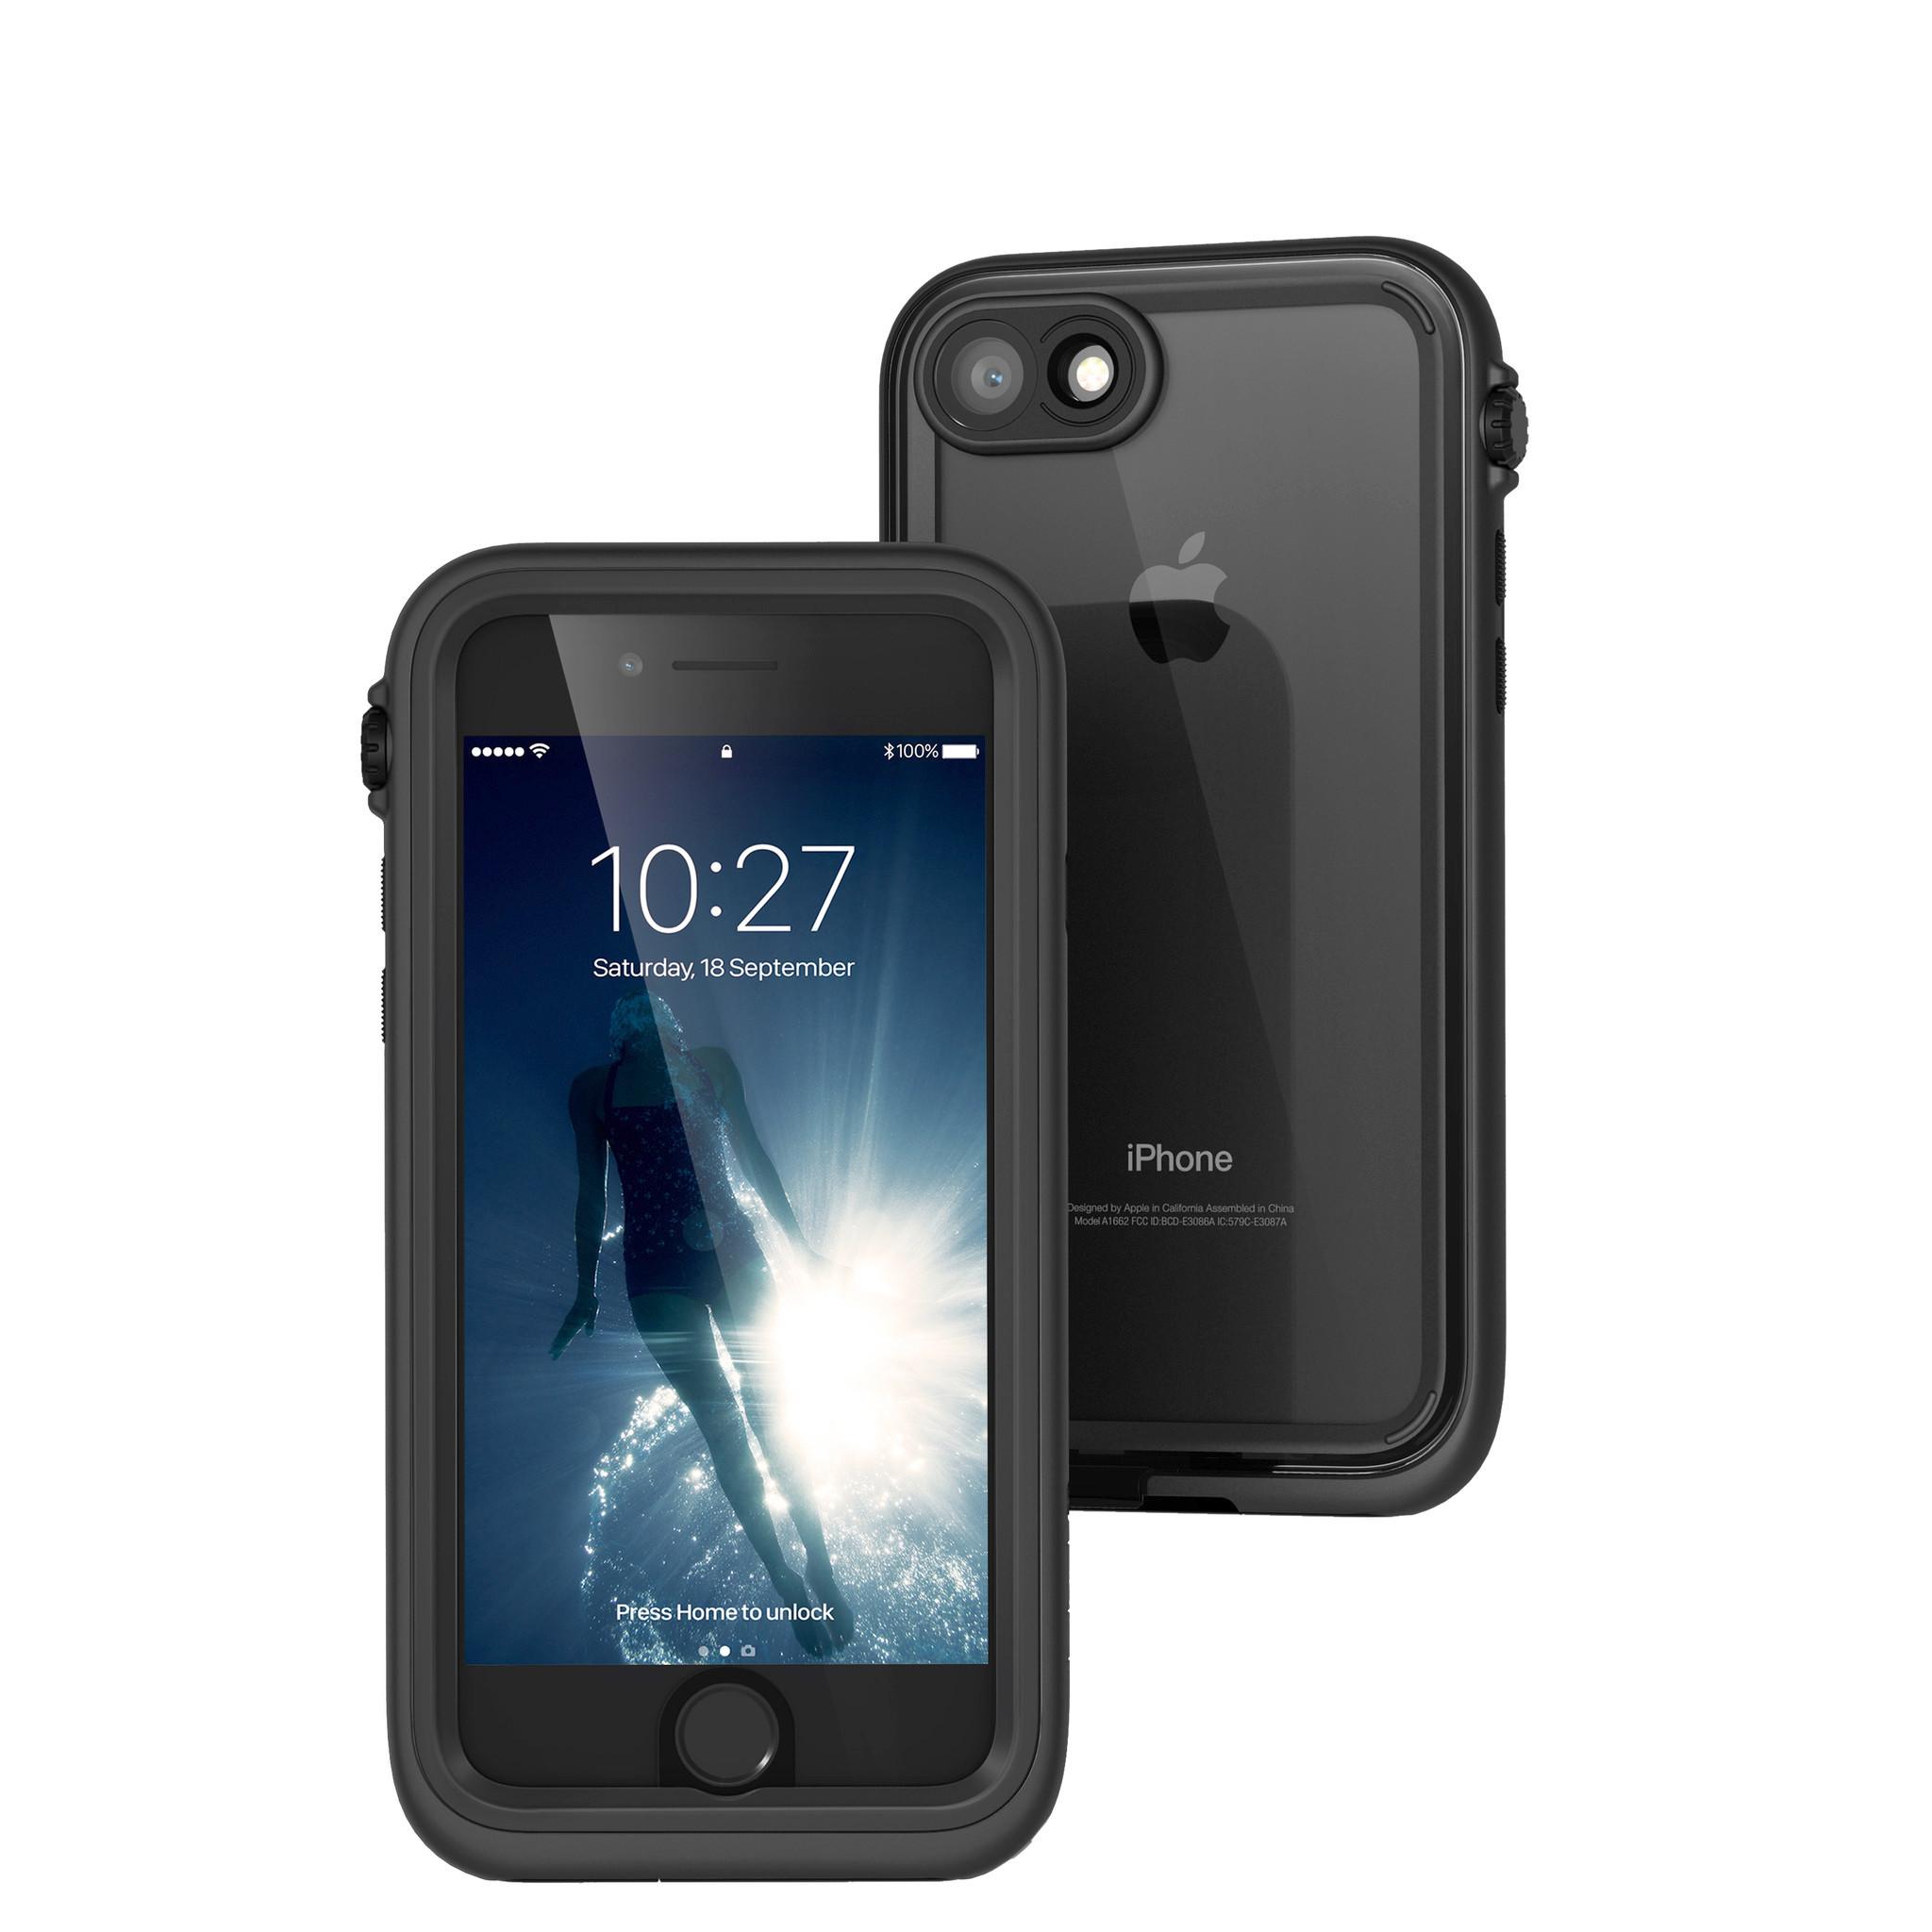 Voděodolné pouzdro / kryt pro Apple iPhone 7 - Catalyst, Waterproof Case Black